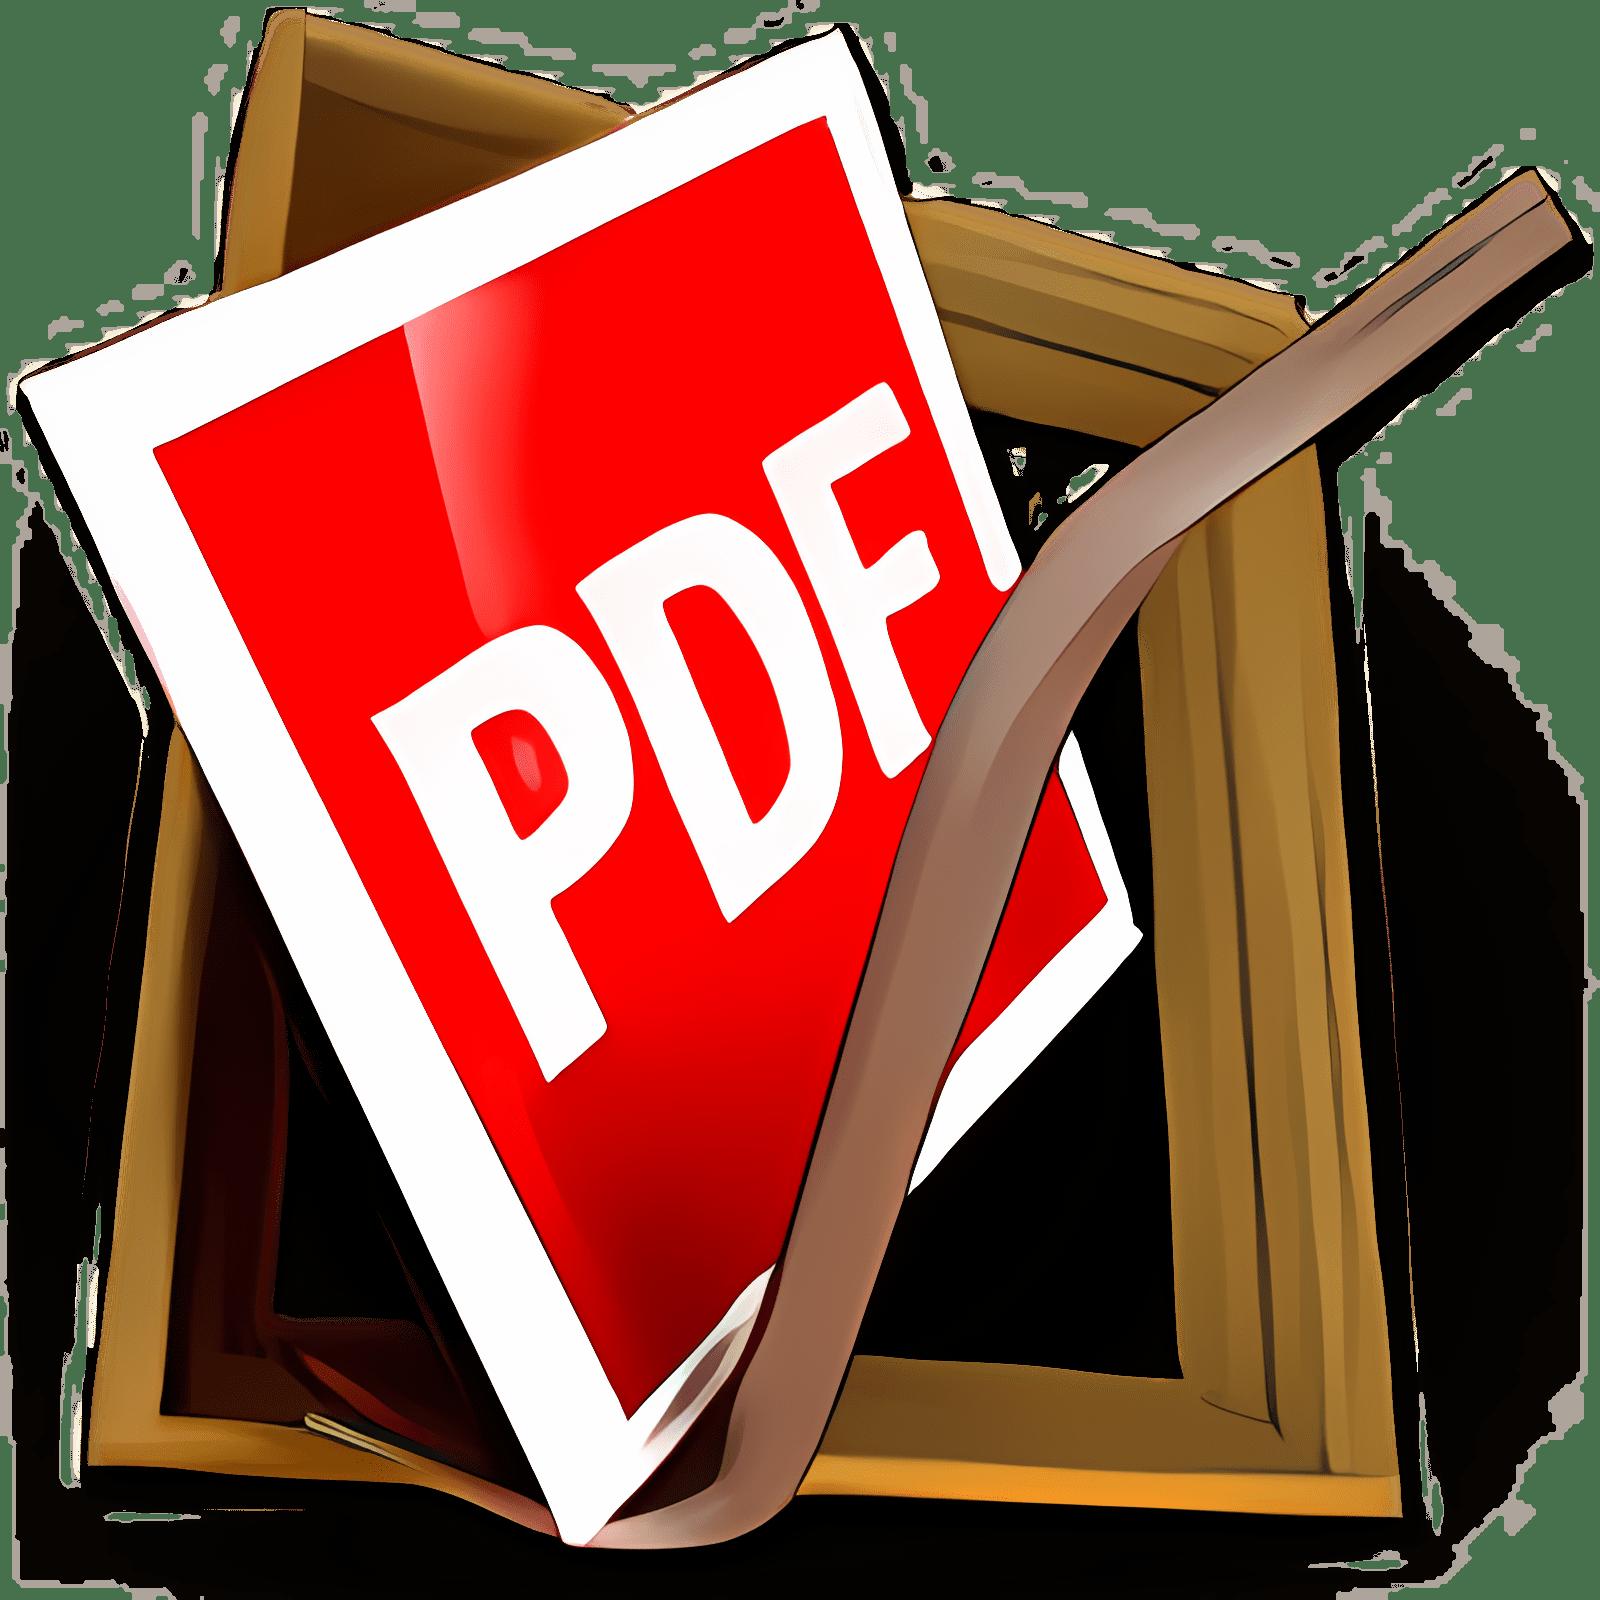 PDF Image Extractor 2.0.1